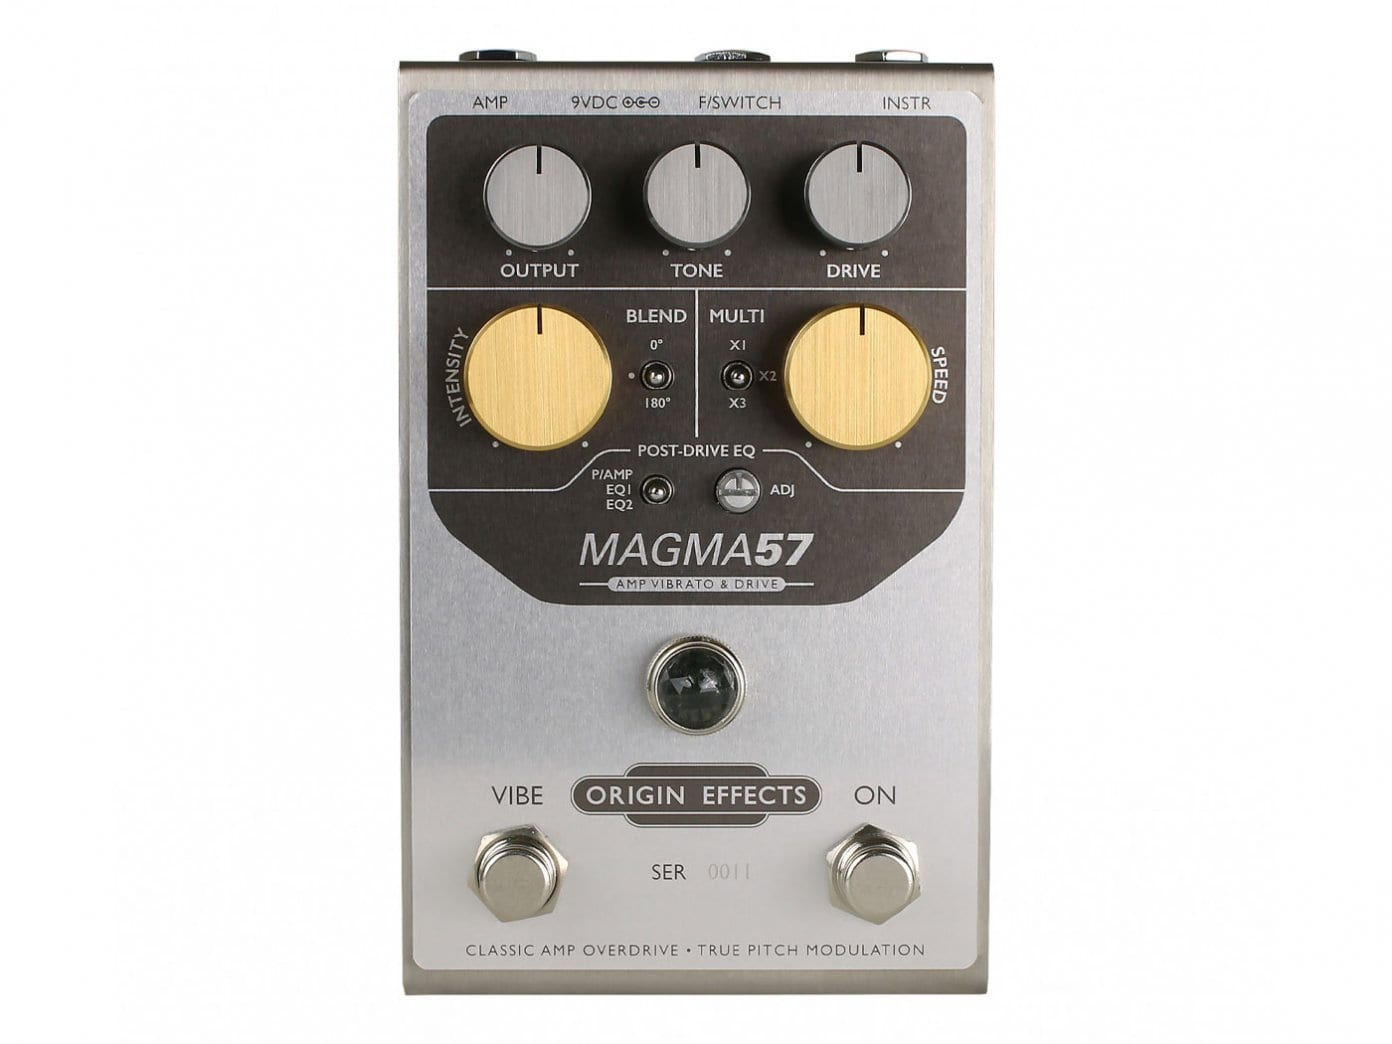 Origin Effects MAGMA57 pedal